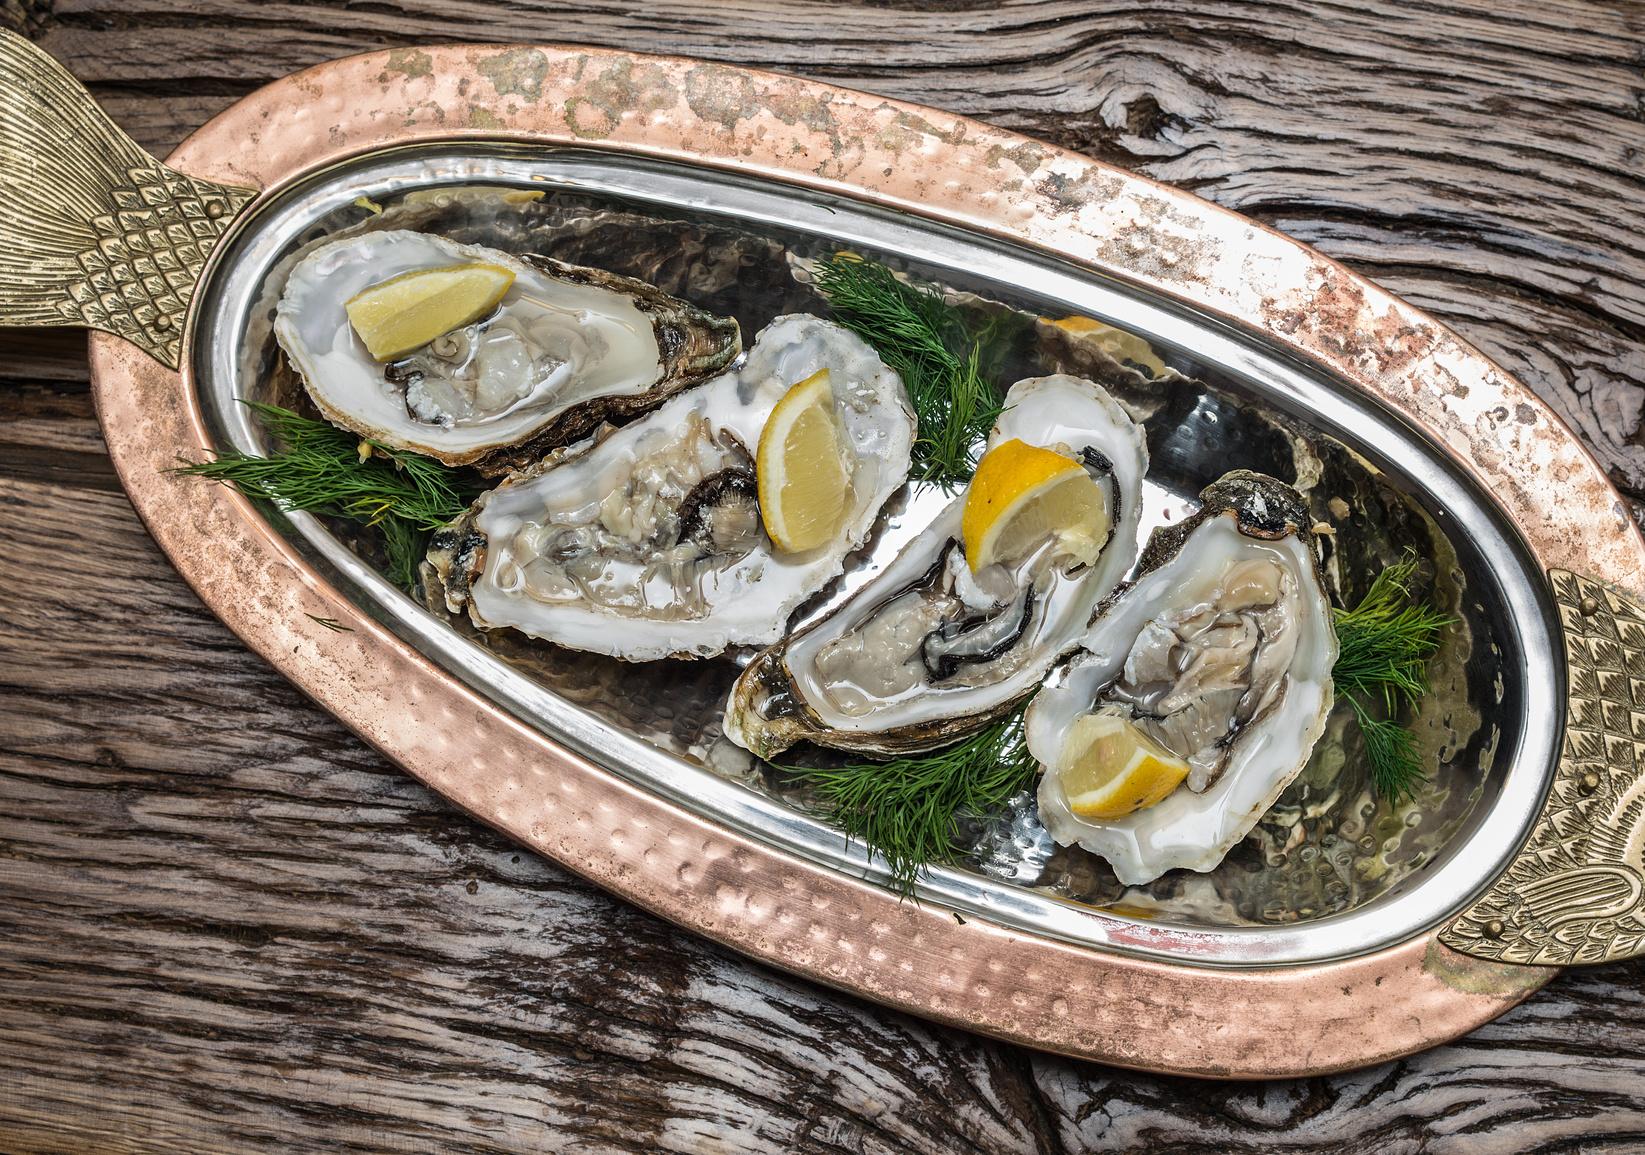 Mediterranean shellfish